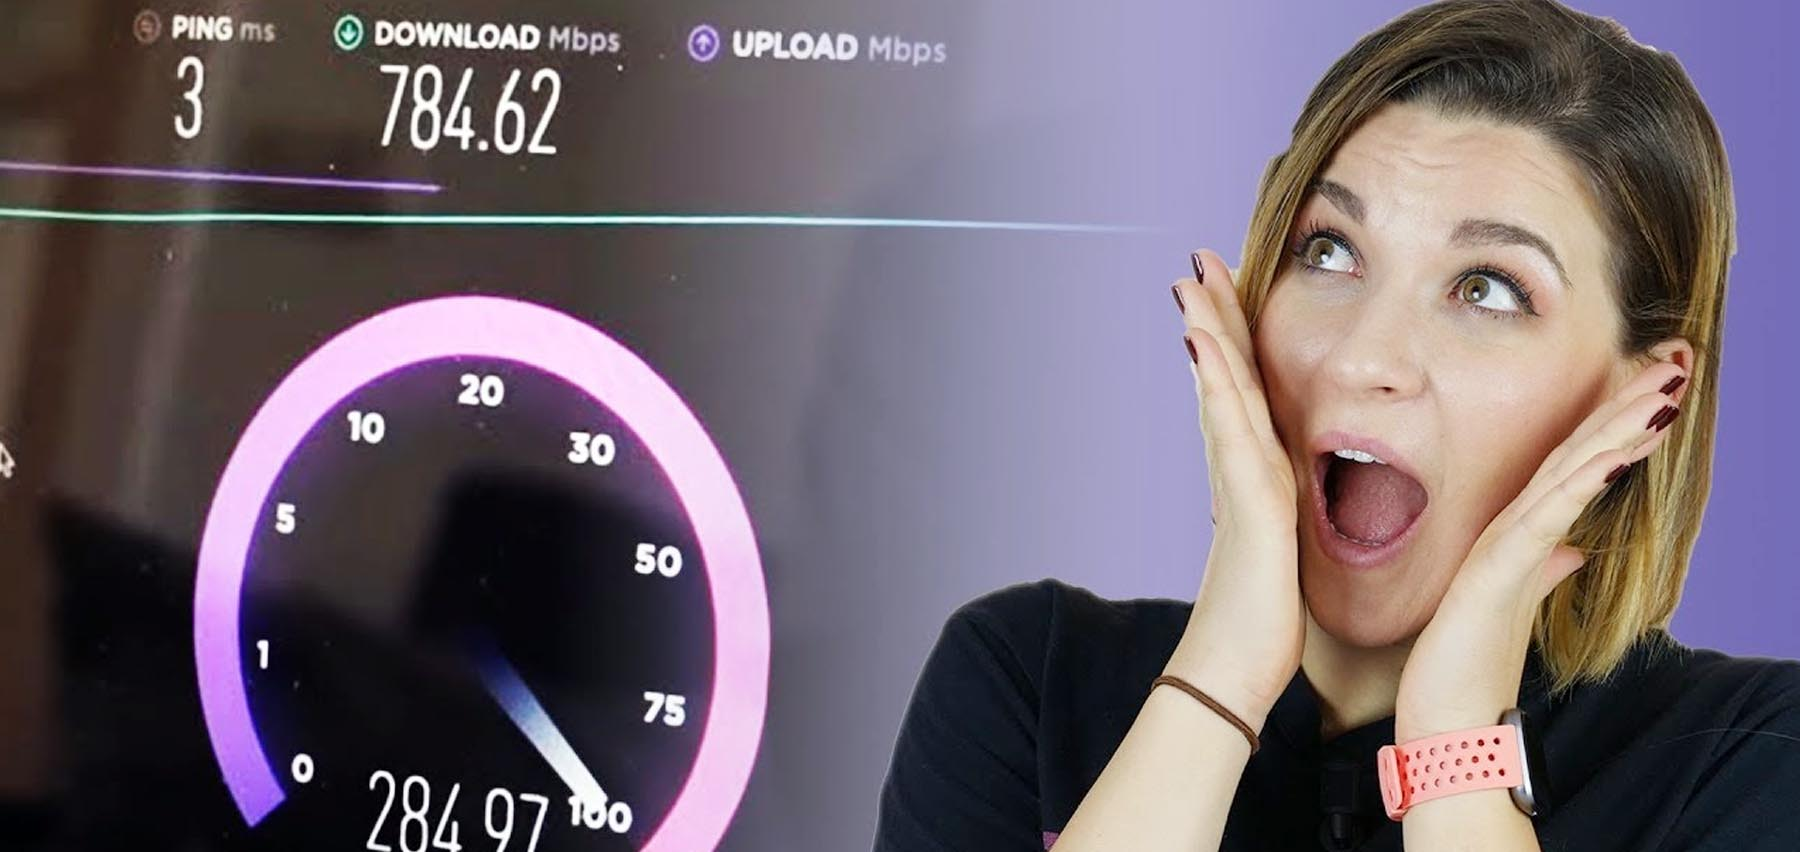 Ultrainternet Fibra